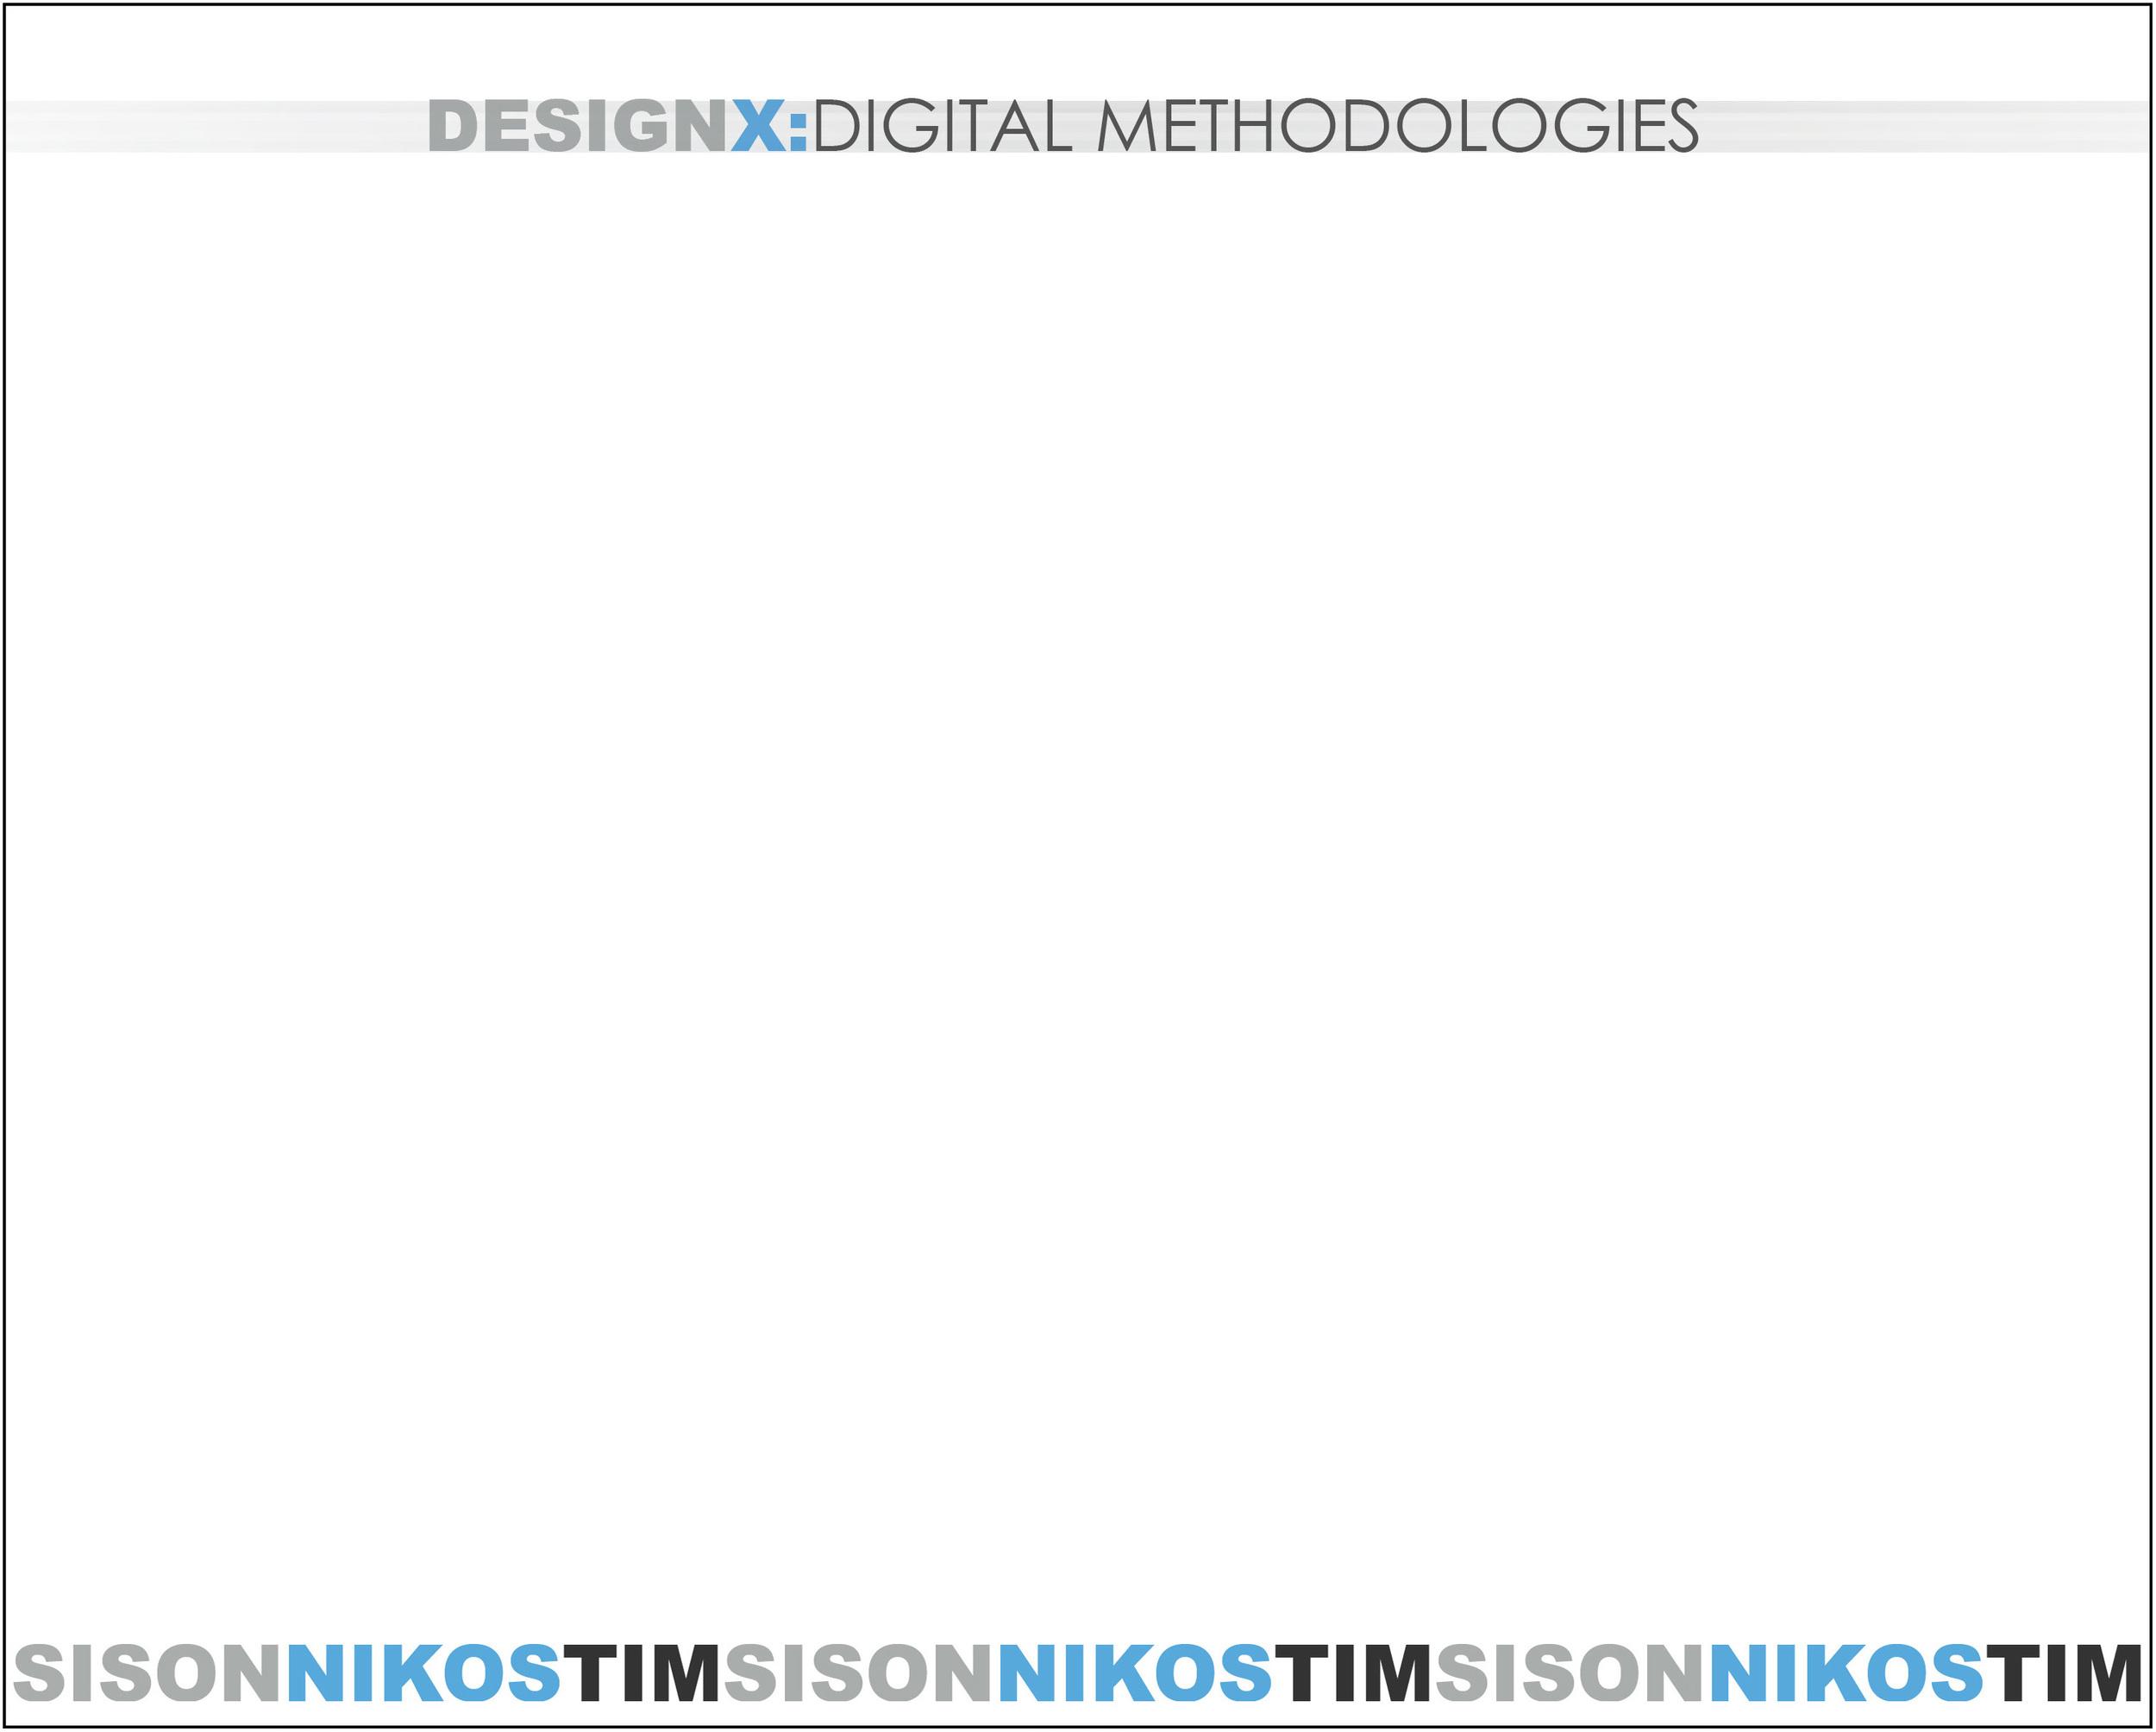 Design X: Digital Methodologies